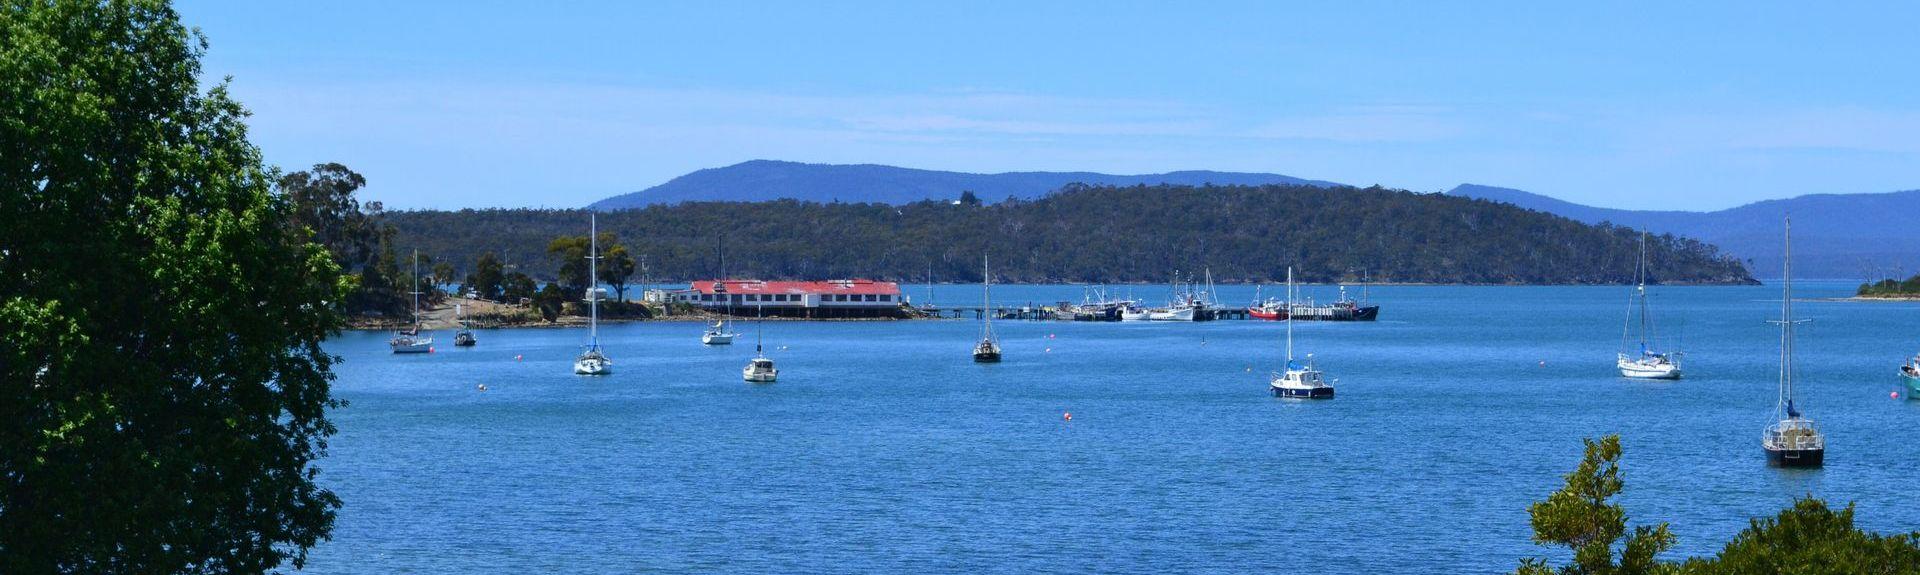 Bruny Island Ferry - Roberts Point Ferry Terminal, North Bruny, Tasmanien, Australien